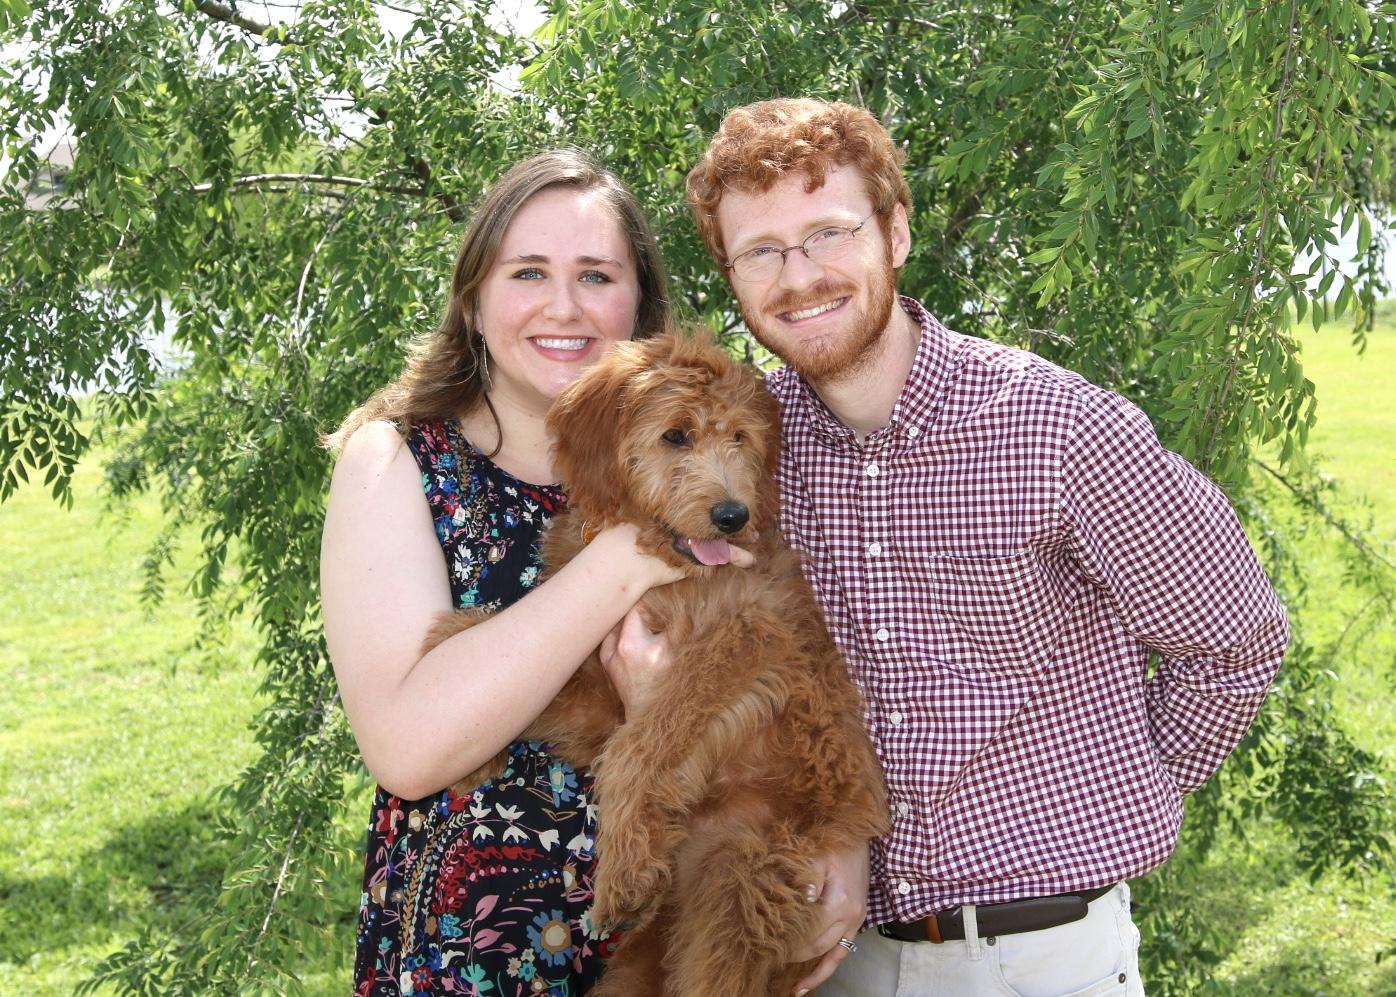 A portrait of my little family: me, Reece & Puddin'